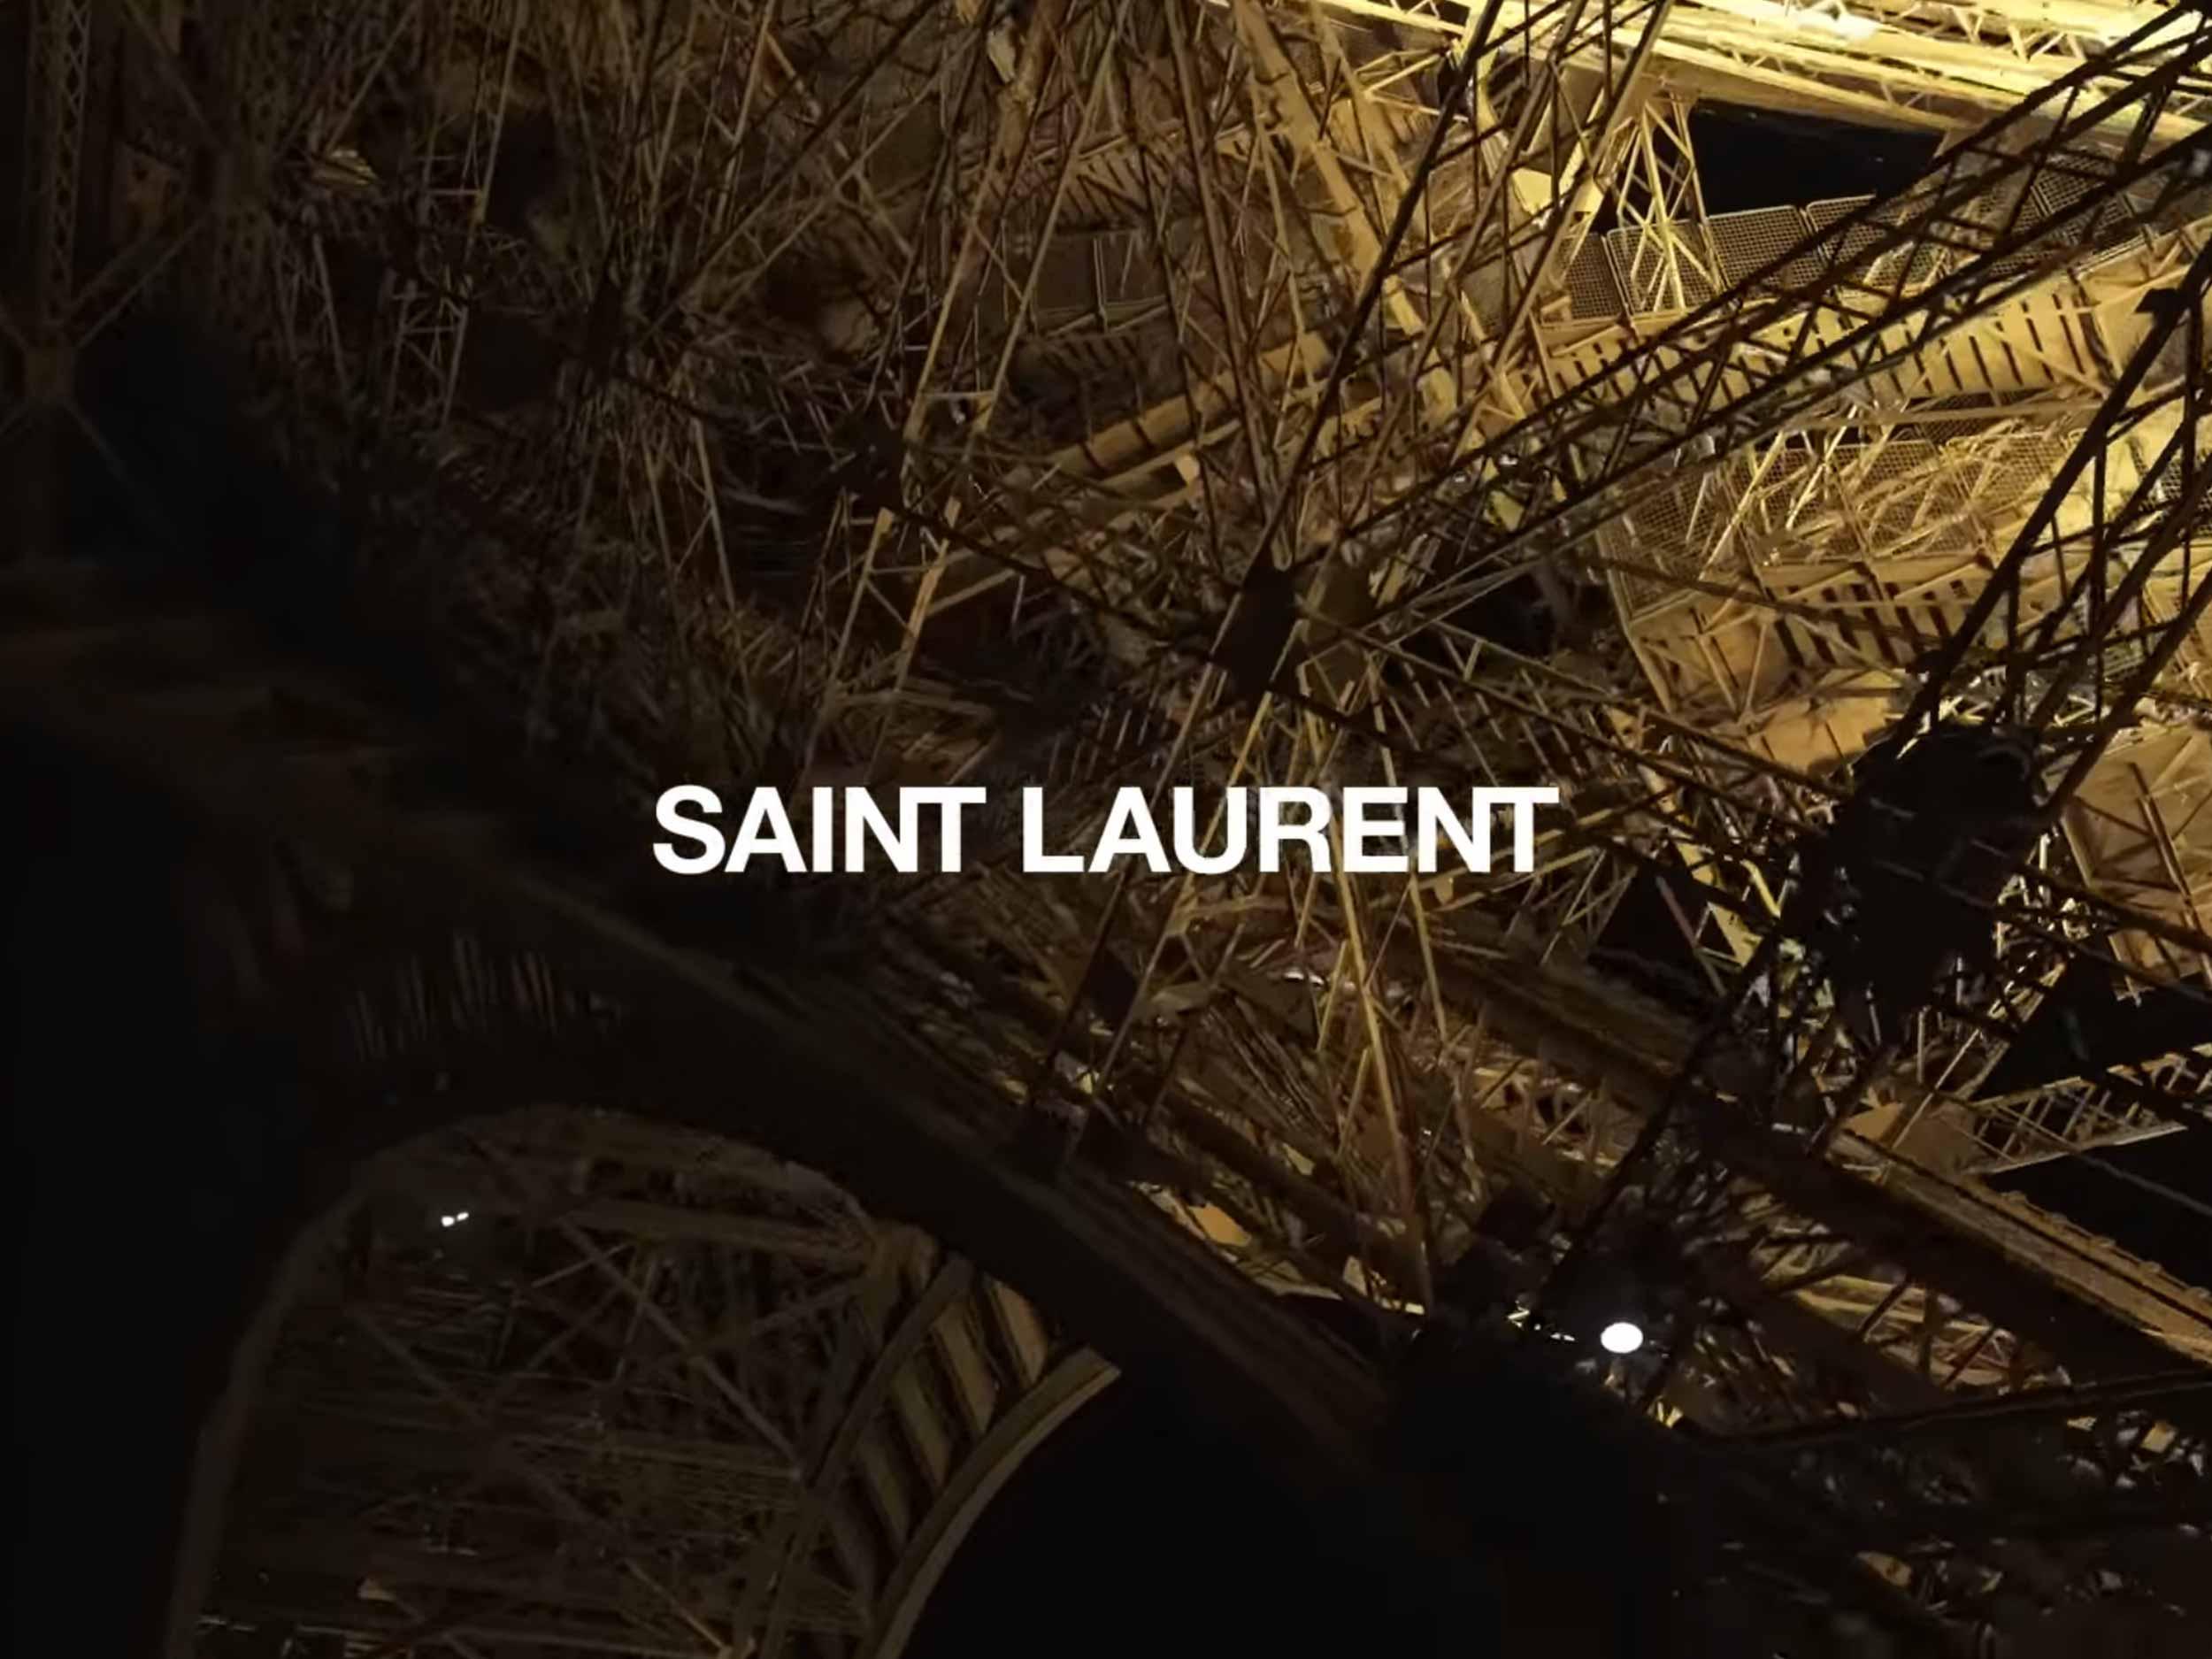 Livestream the Saint Laurent Summer 2022 show here